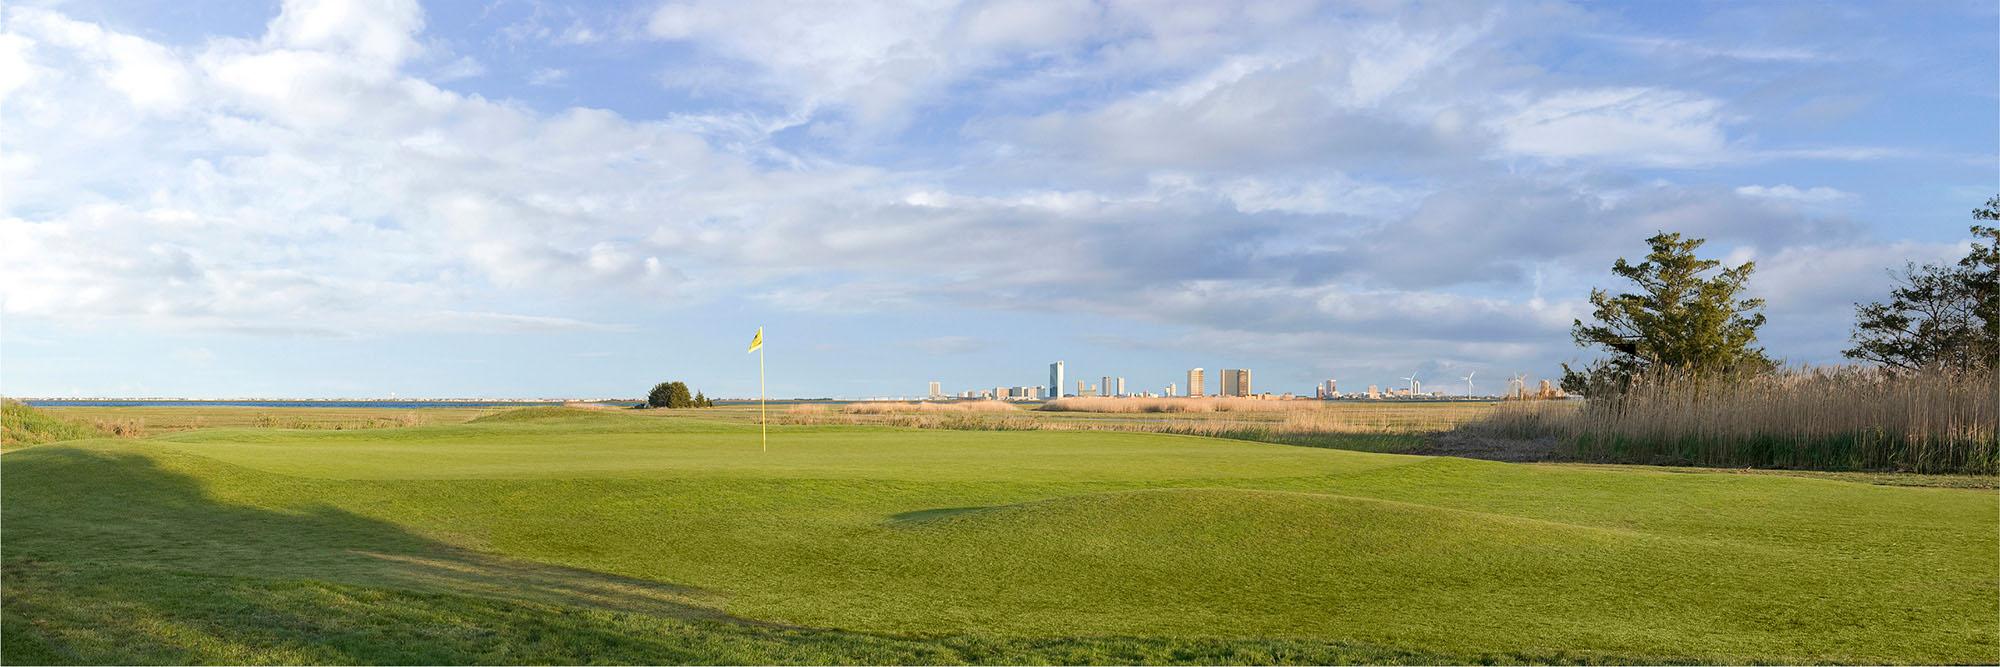 Golf Course Image - Sea View Resort & Spa Bay Course No. 2